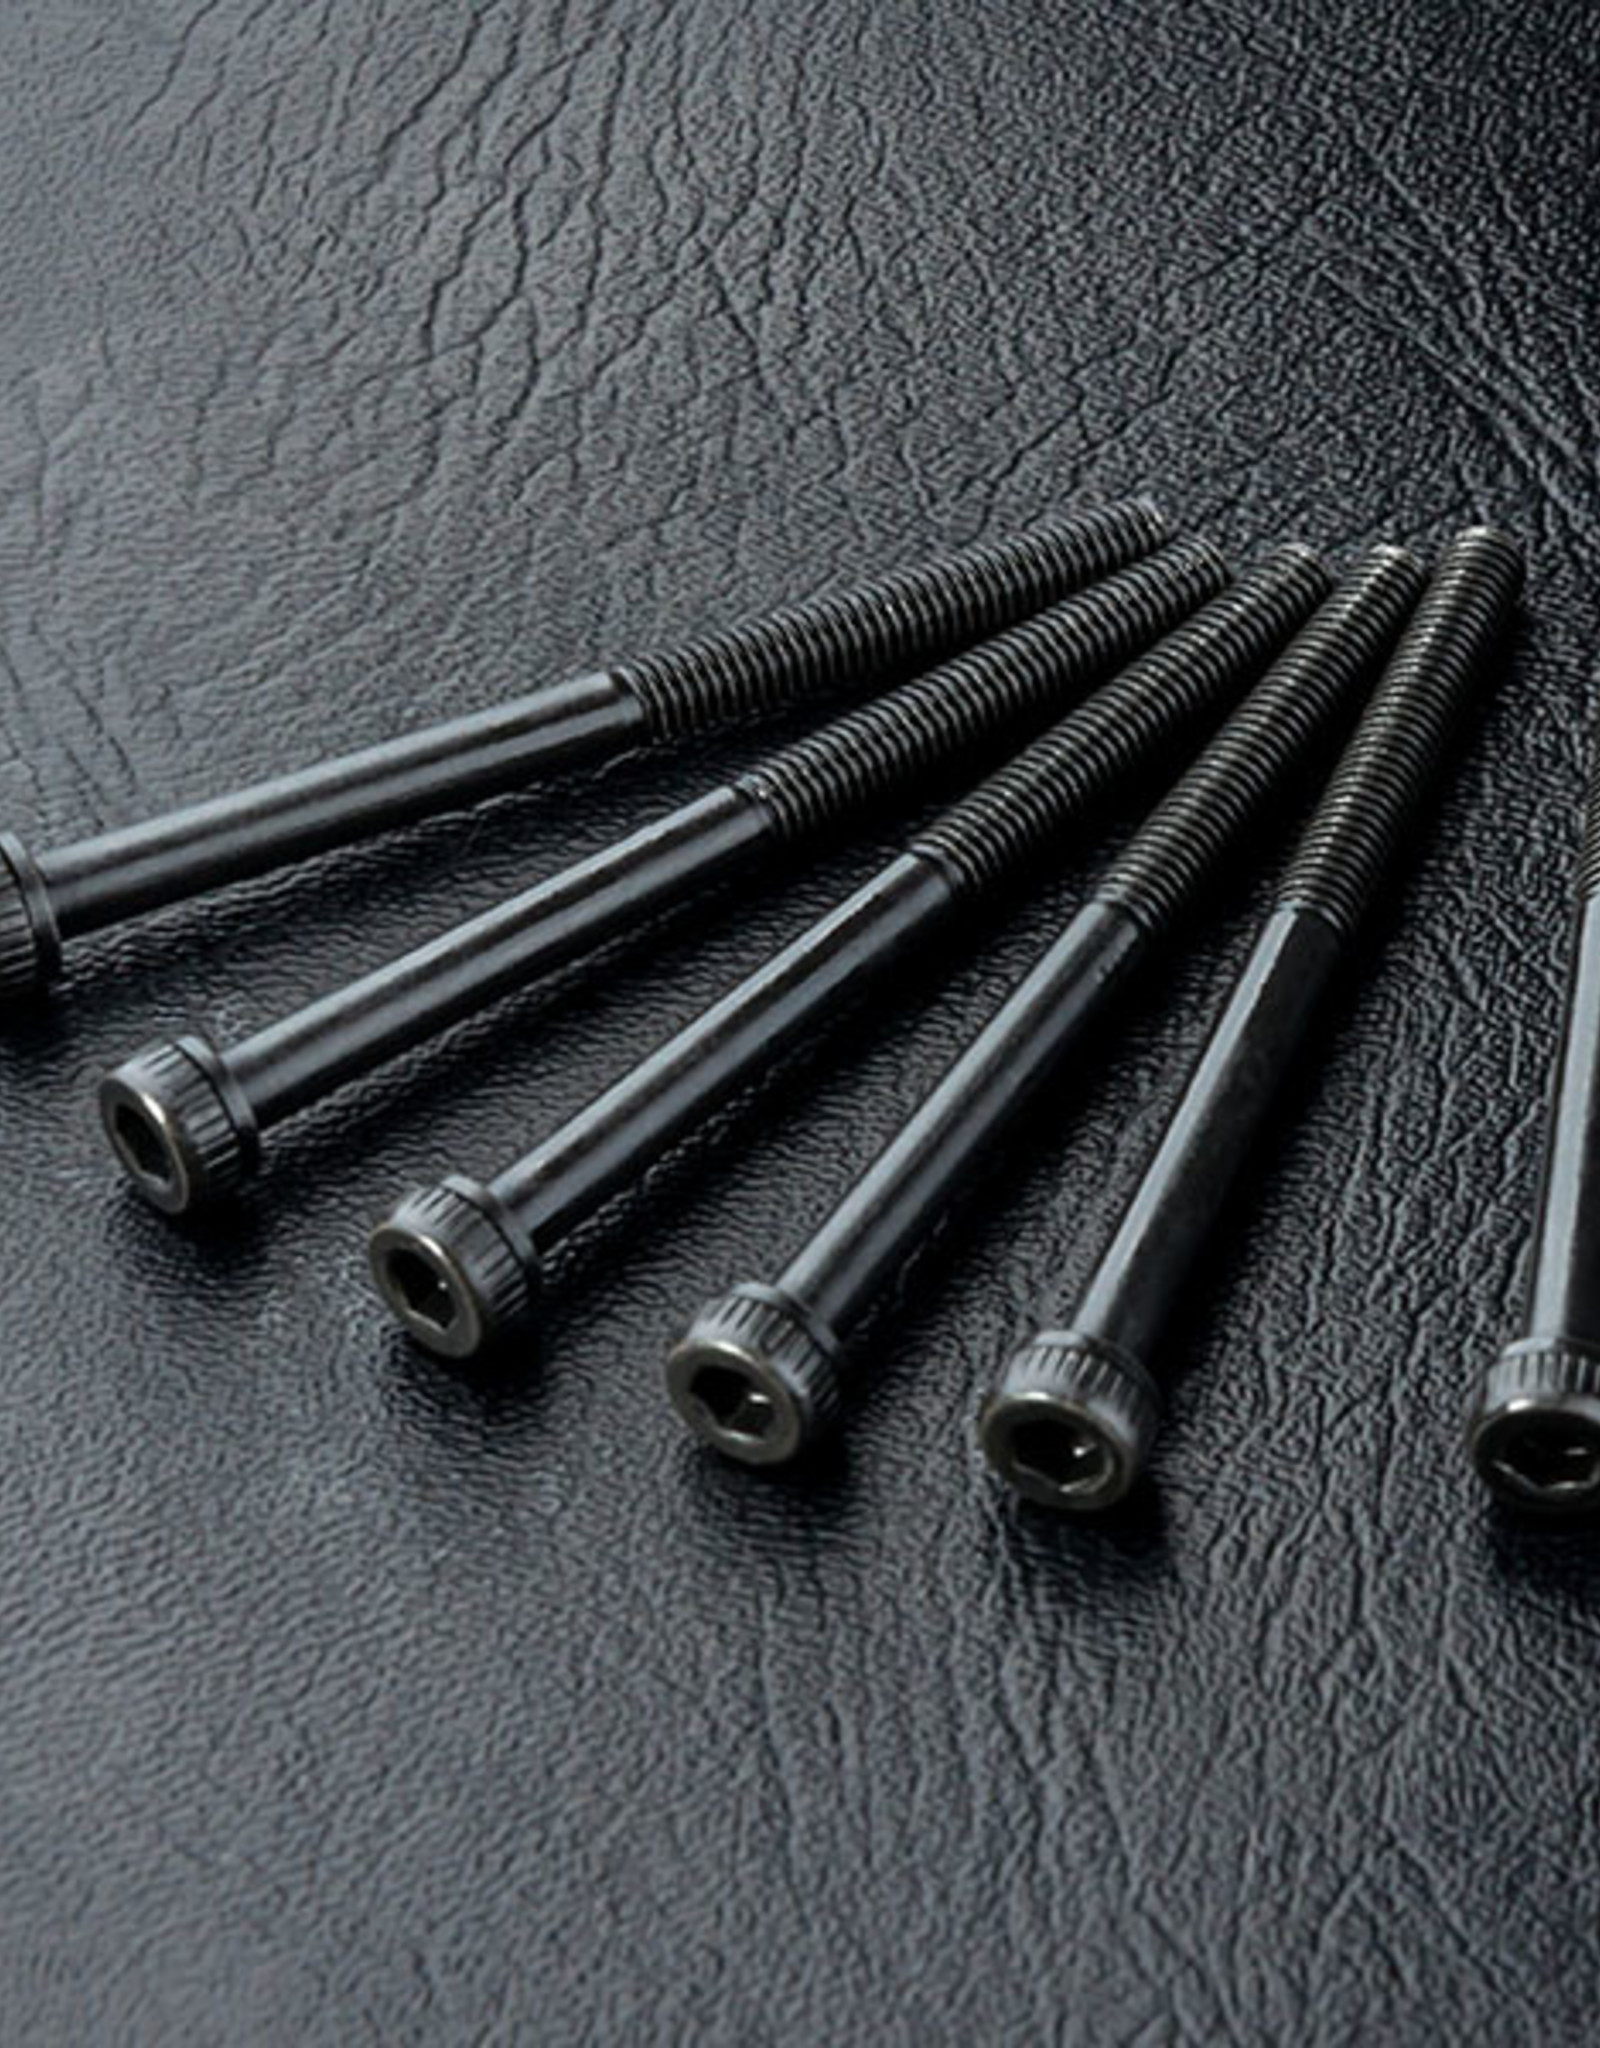 MST MXSPD110091 Cap screw M3X40 (6) 110091 by MST